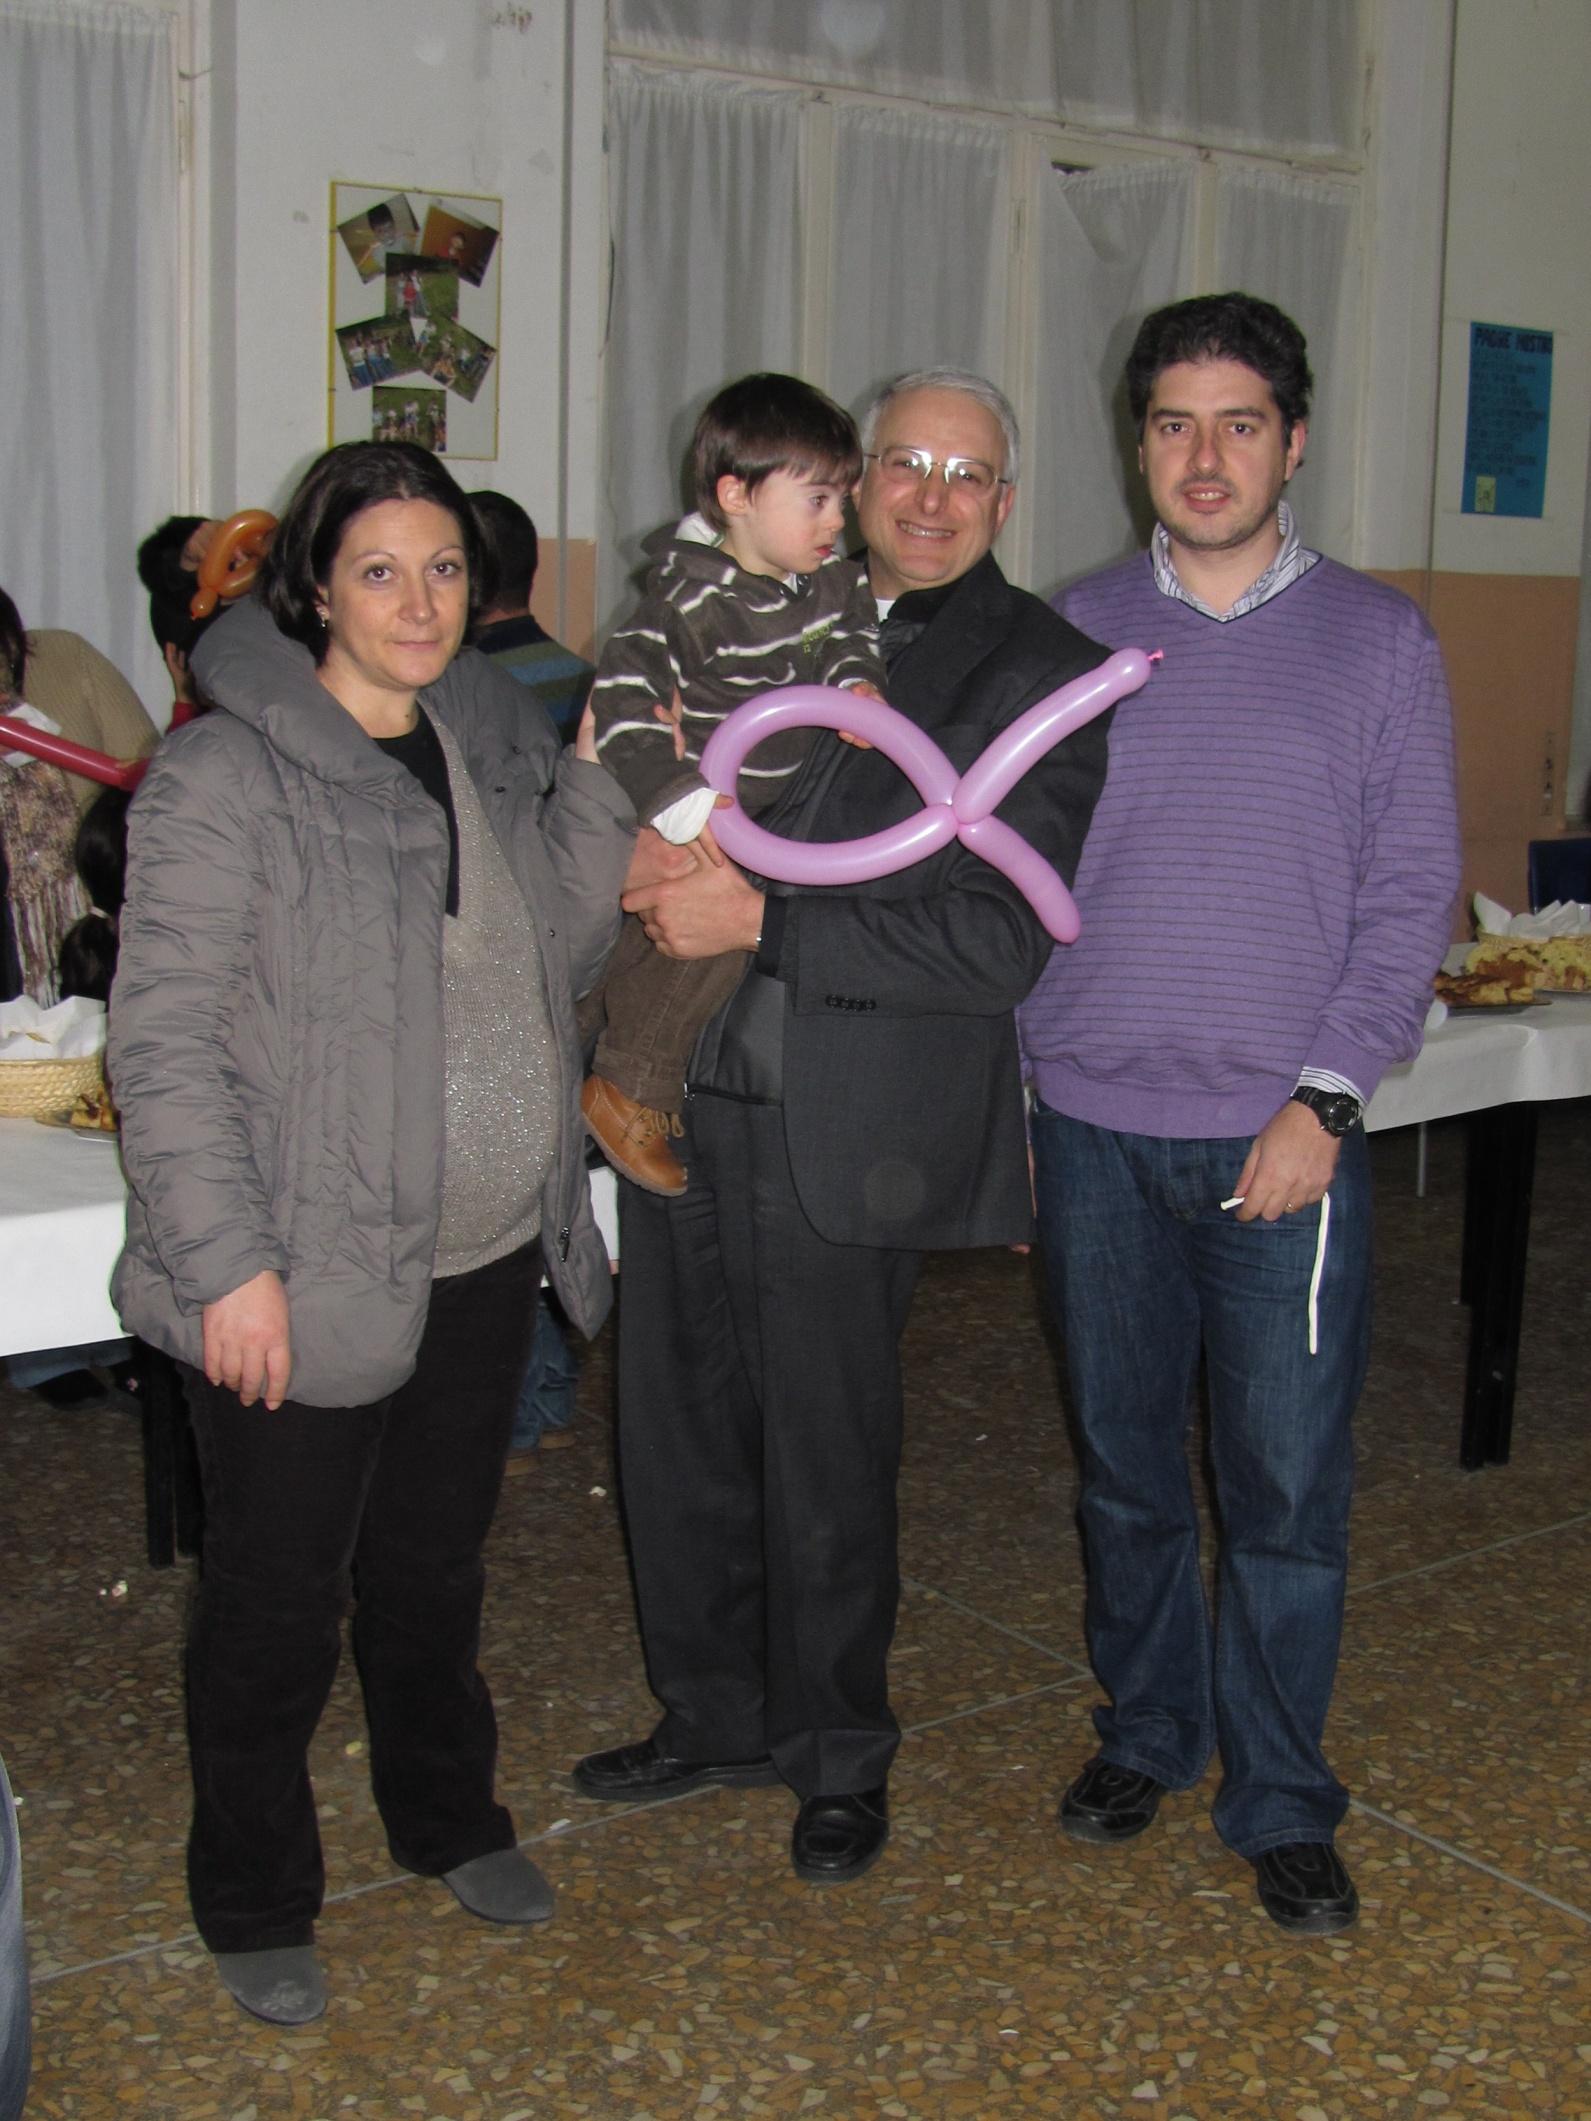 ricordo_battesimo_gesu_2011-01-23-17-04-32